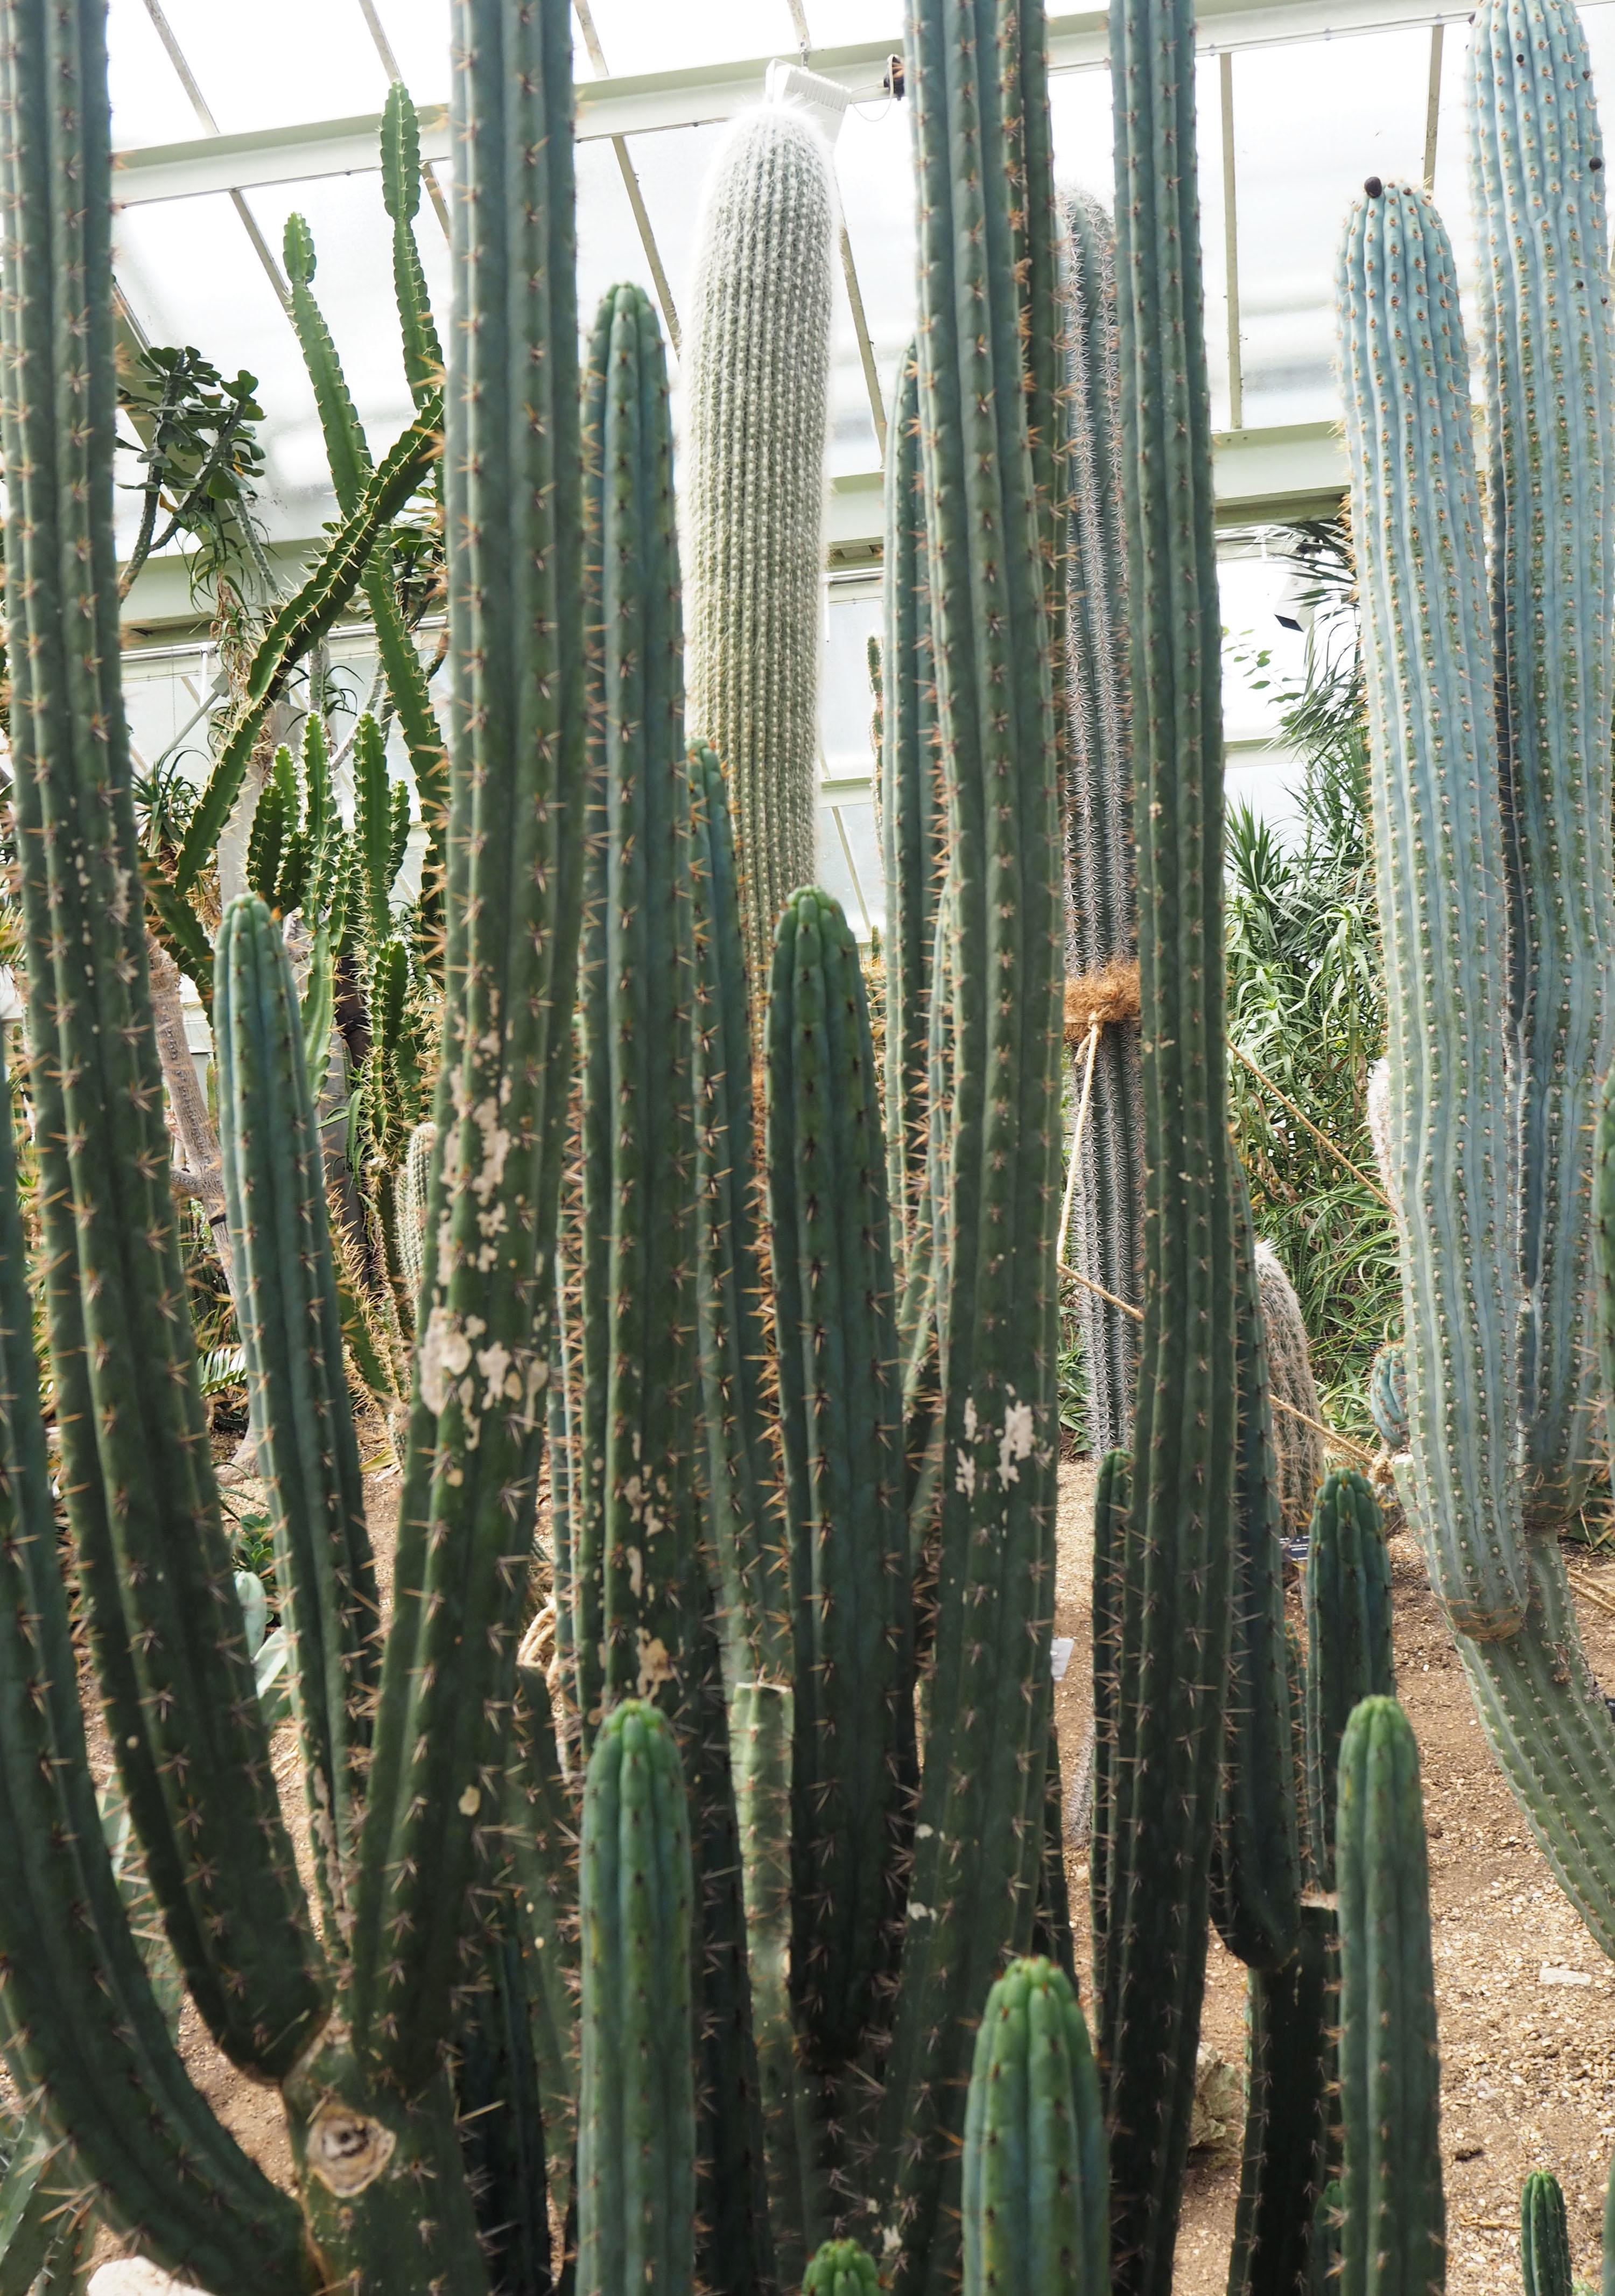 Kew Garden Cactus